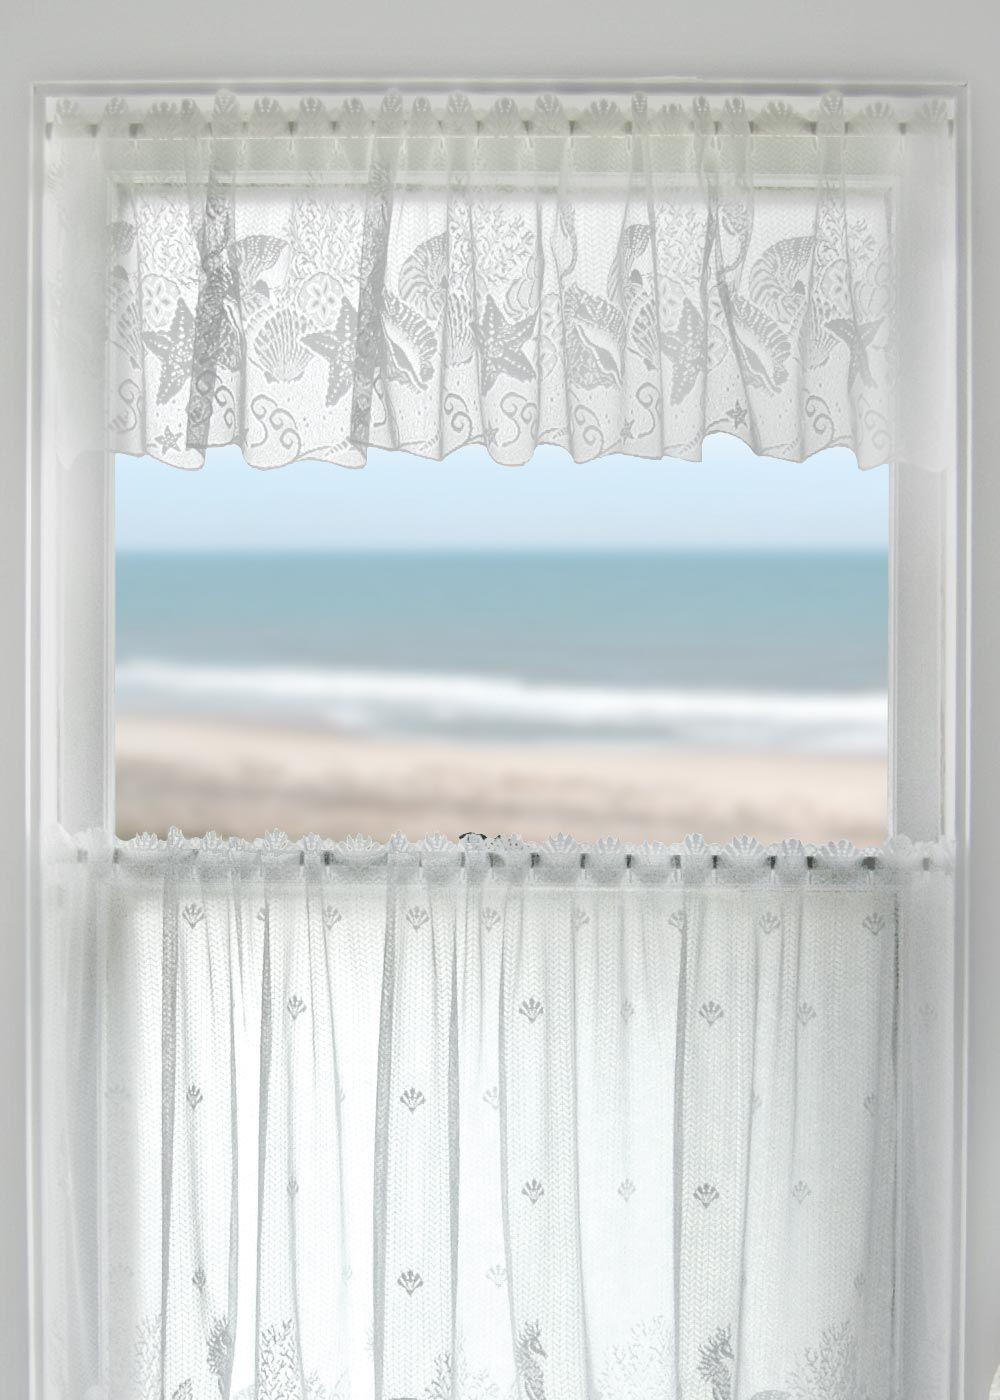 Coastal Seascape Lace Valanceheritage Lace (View 4 of 20)